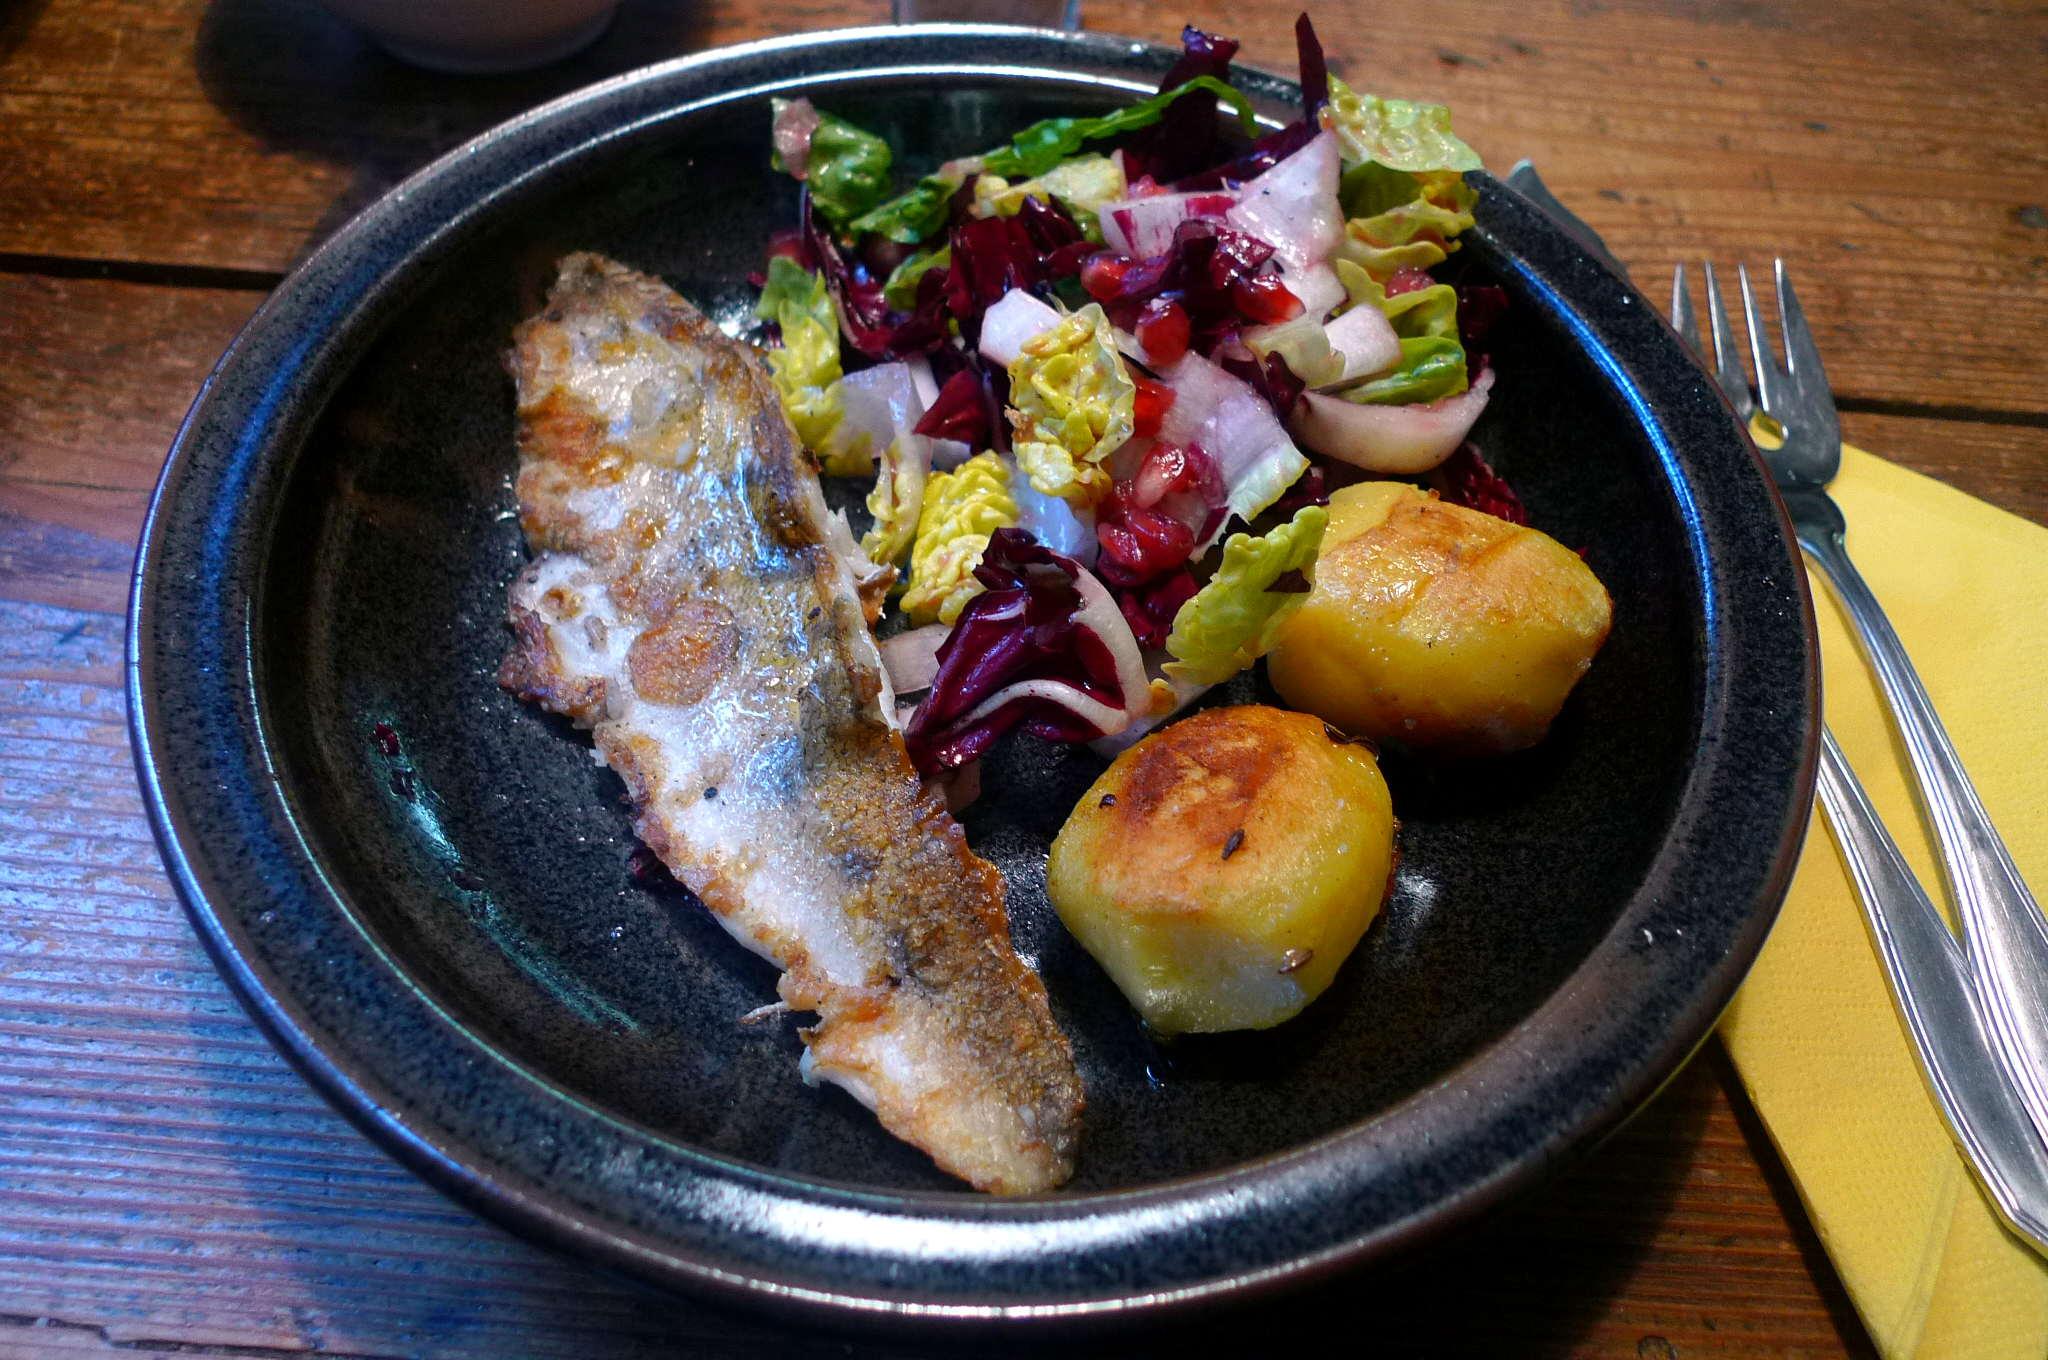 9.2.16 - Zander,Salat,Kartoffel,pescetarisch (1c) (22)